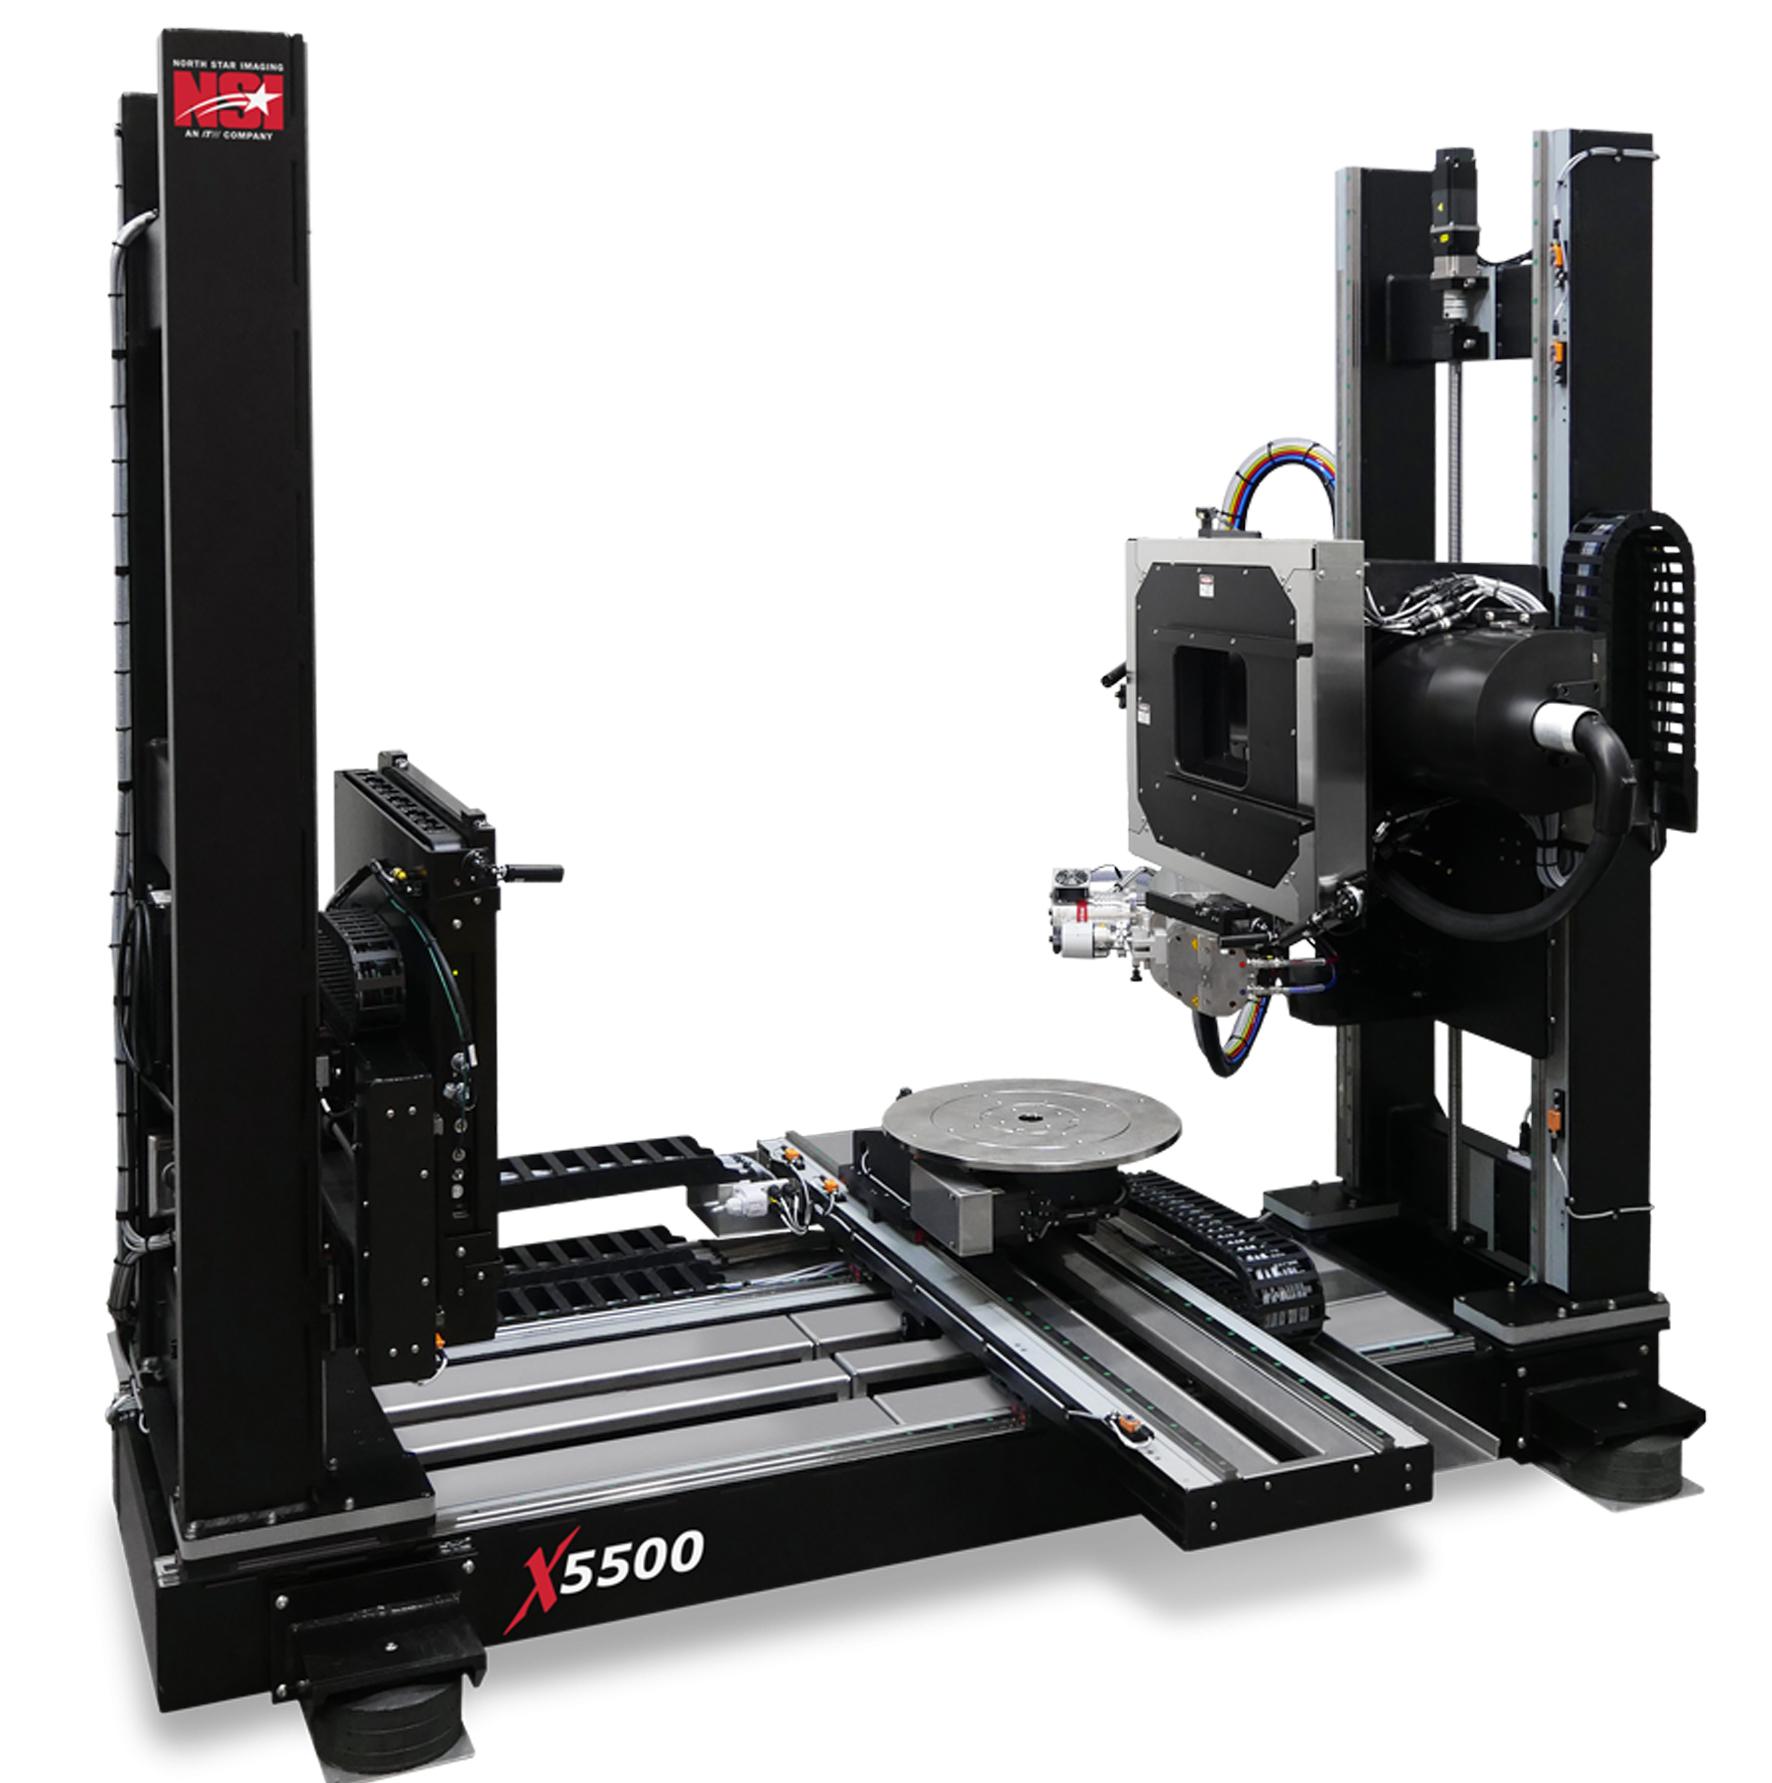 X5500